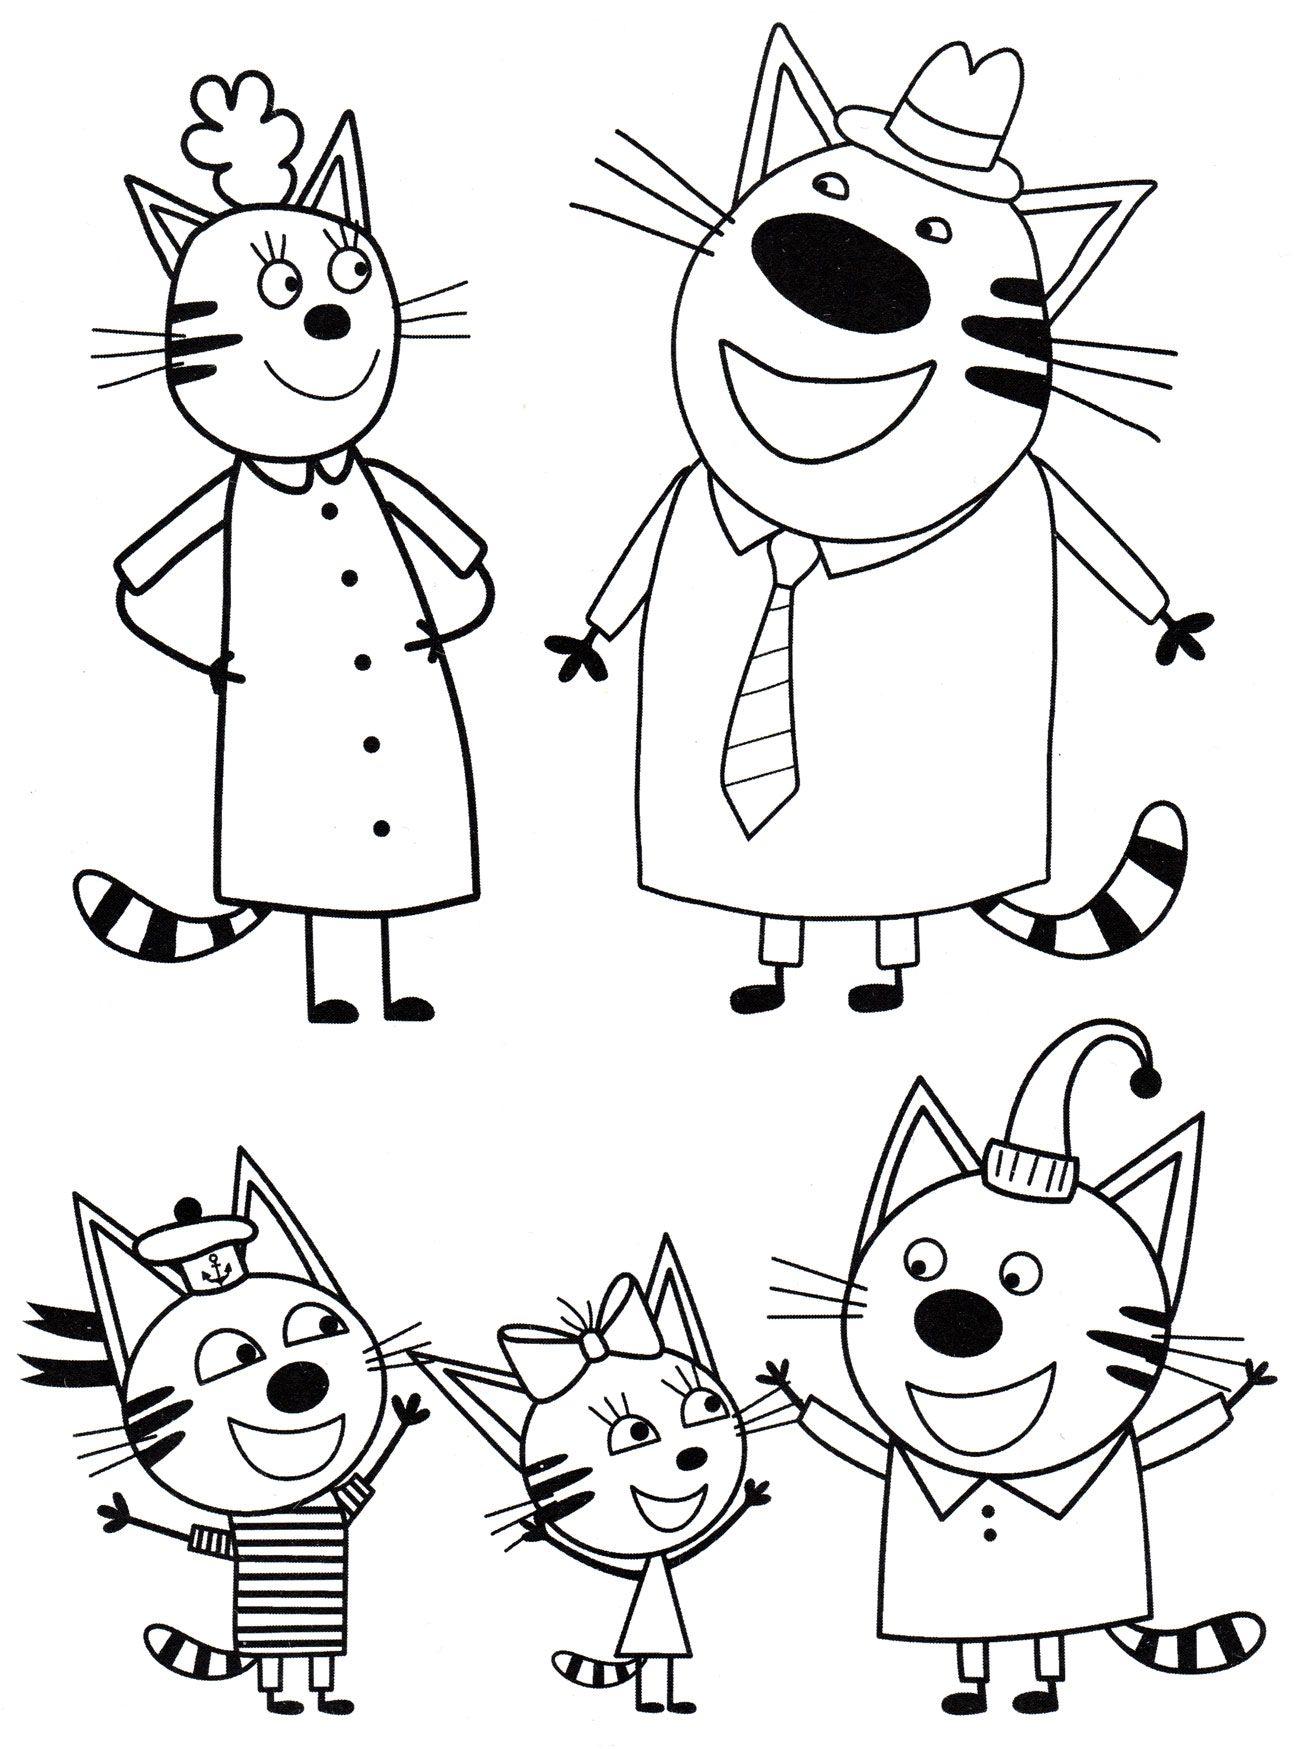 Раскраски «Три кота» - «Вся семья» | Раскраски